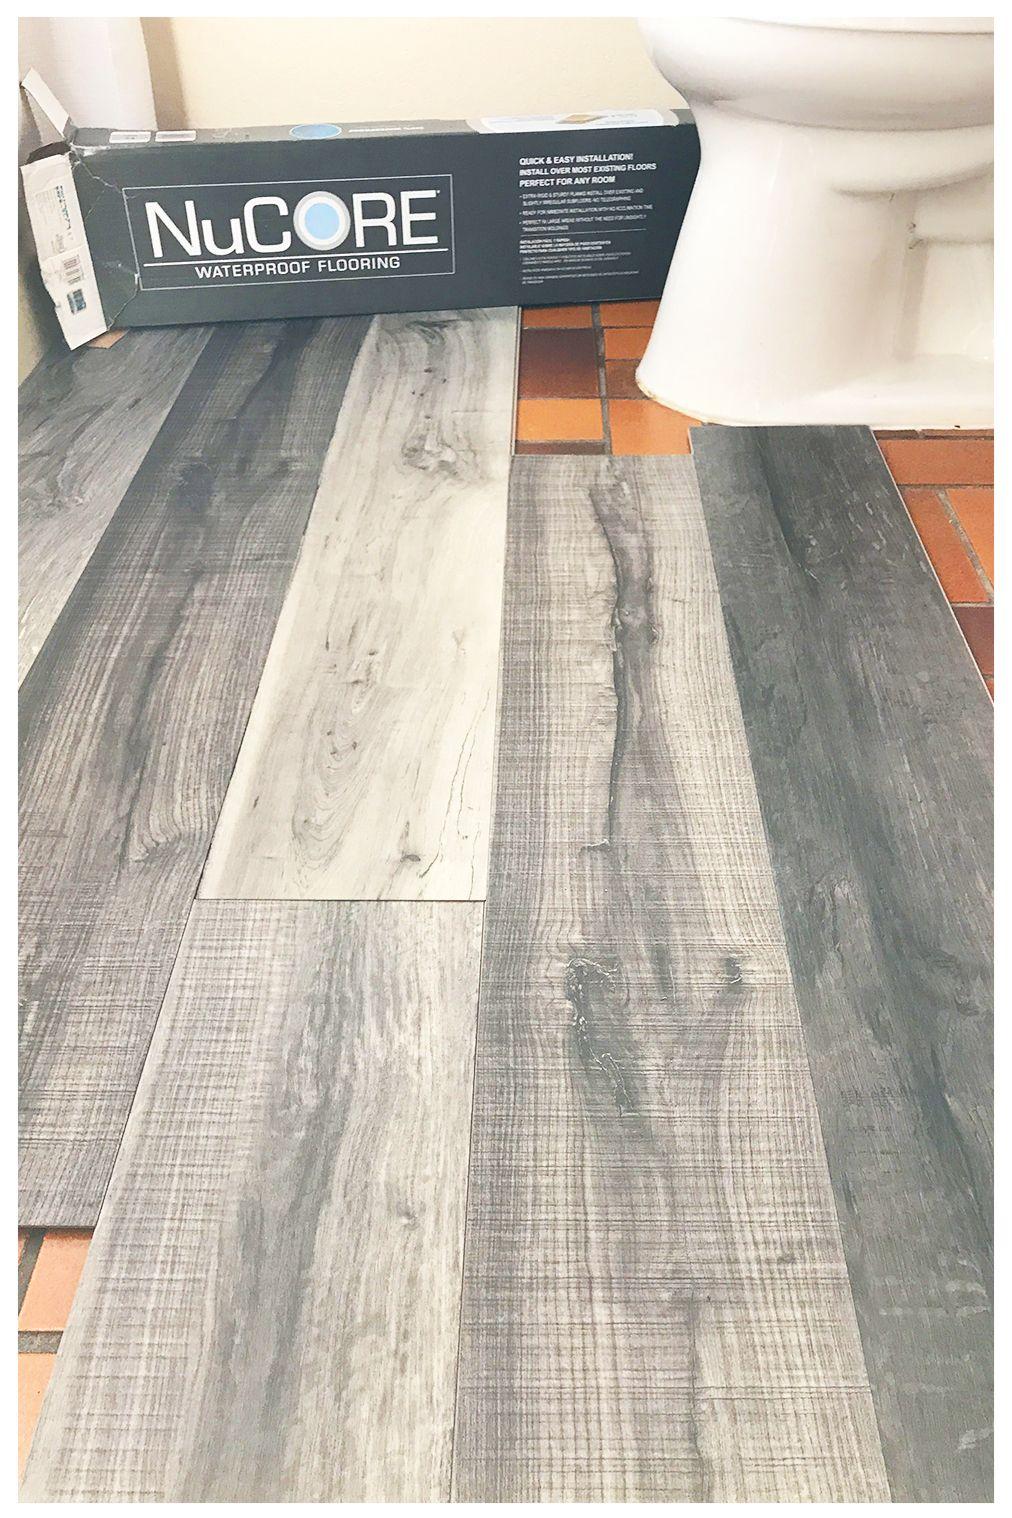 20 Exclusive Bathroom Flooring Design 2020 Tips Ideas In 2020 Flooring Bathroom Remodel Master Home Remodeling